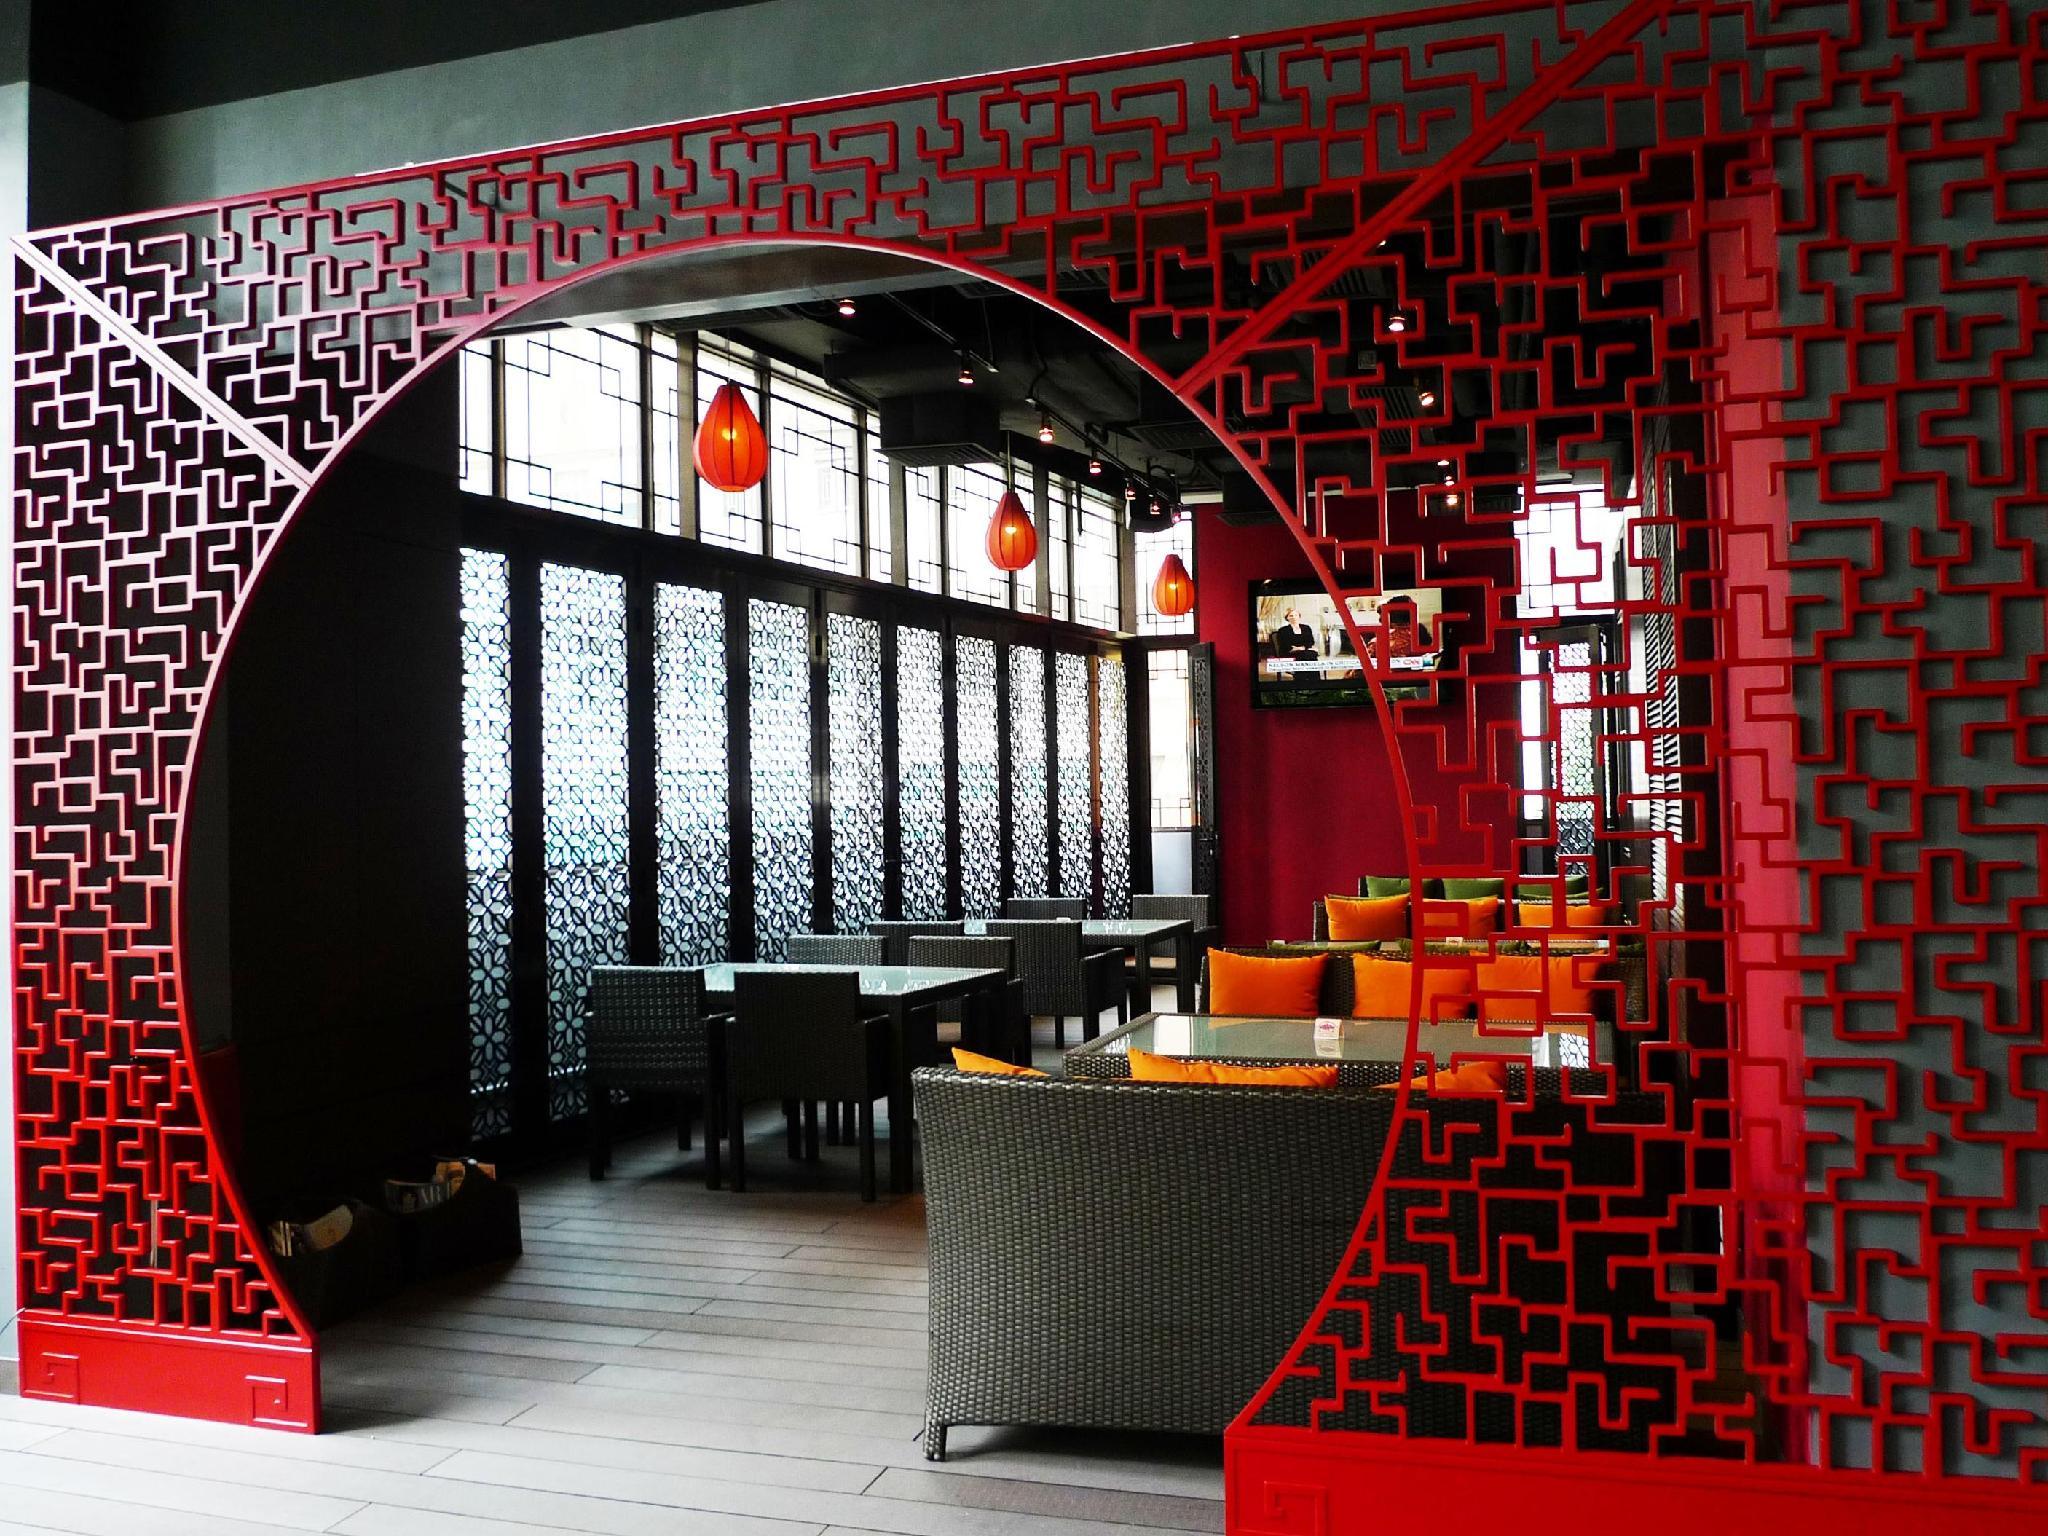 Lan Kwai Fong Hotel @ Kau U Fong Χονγκ Κονγκ